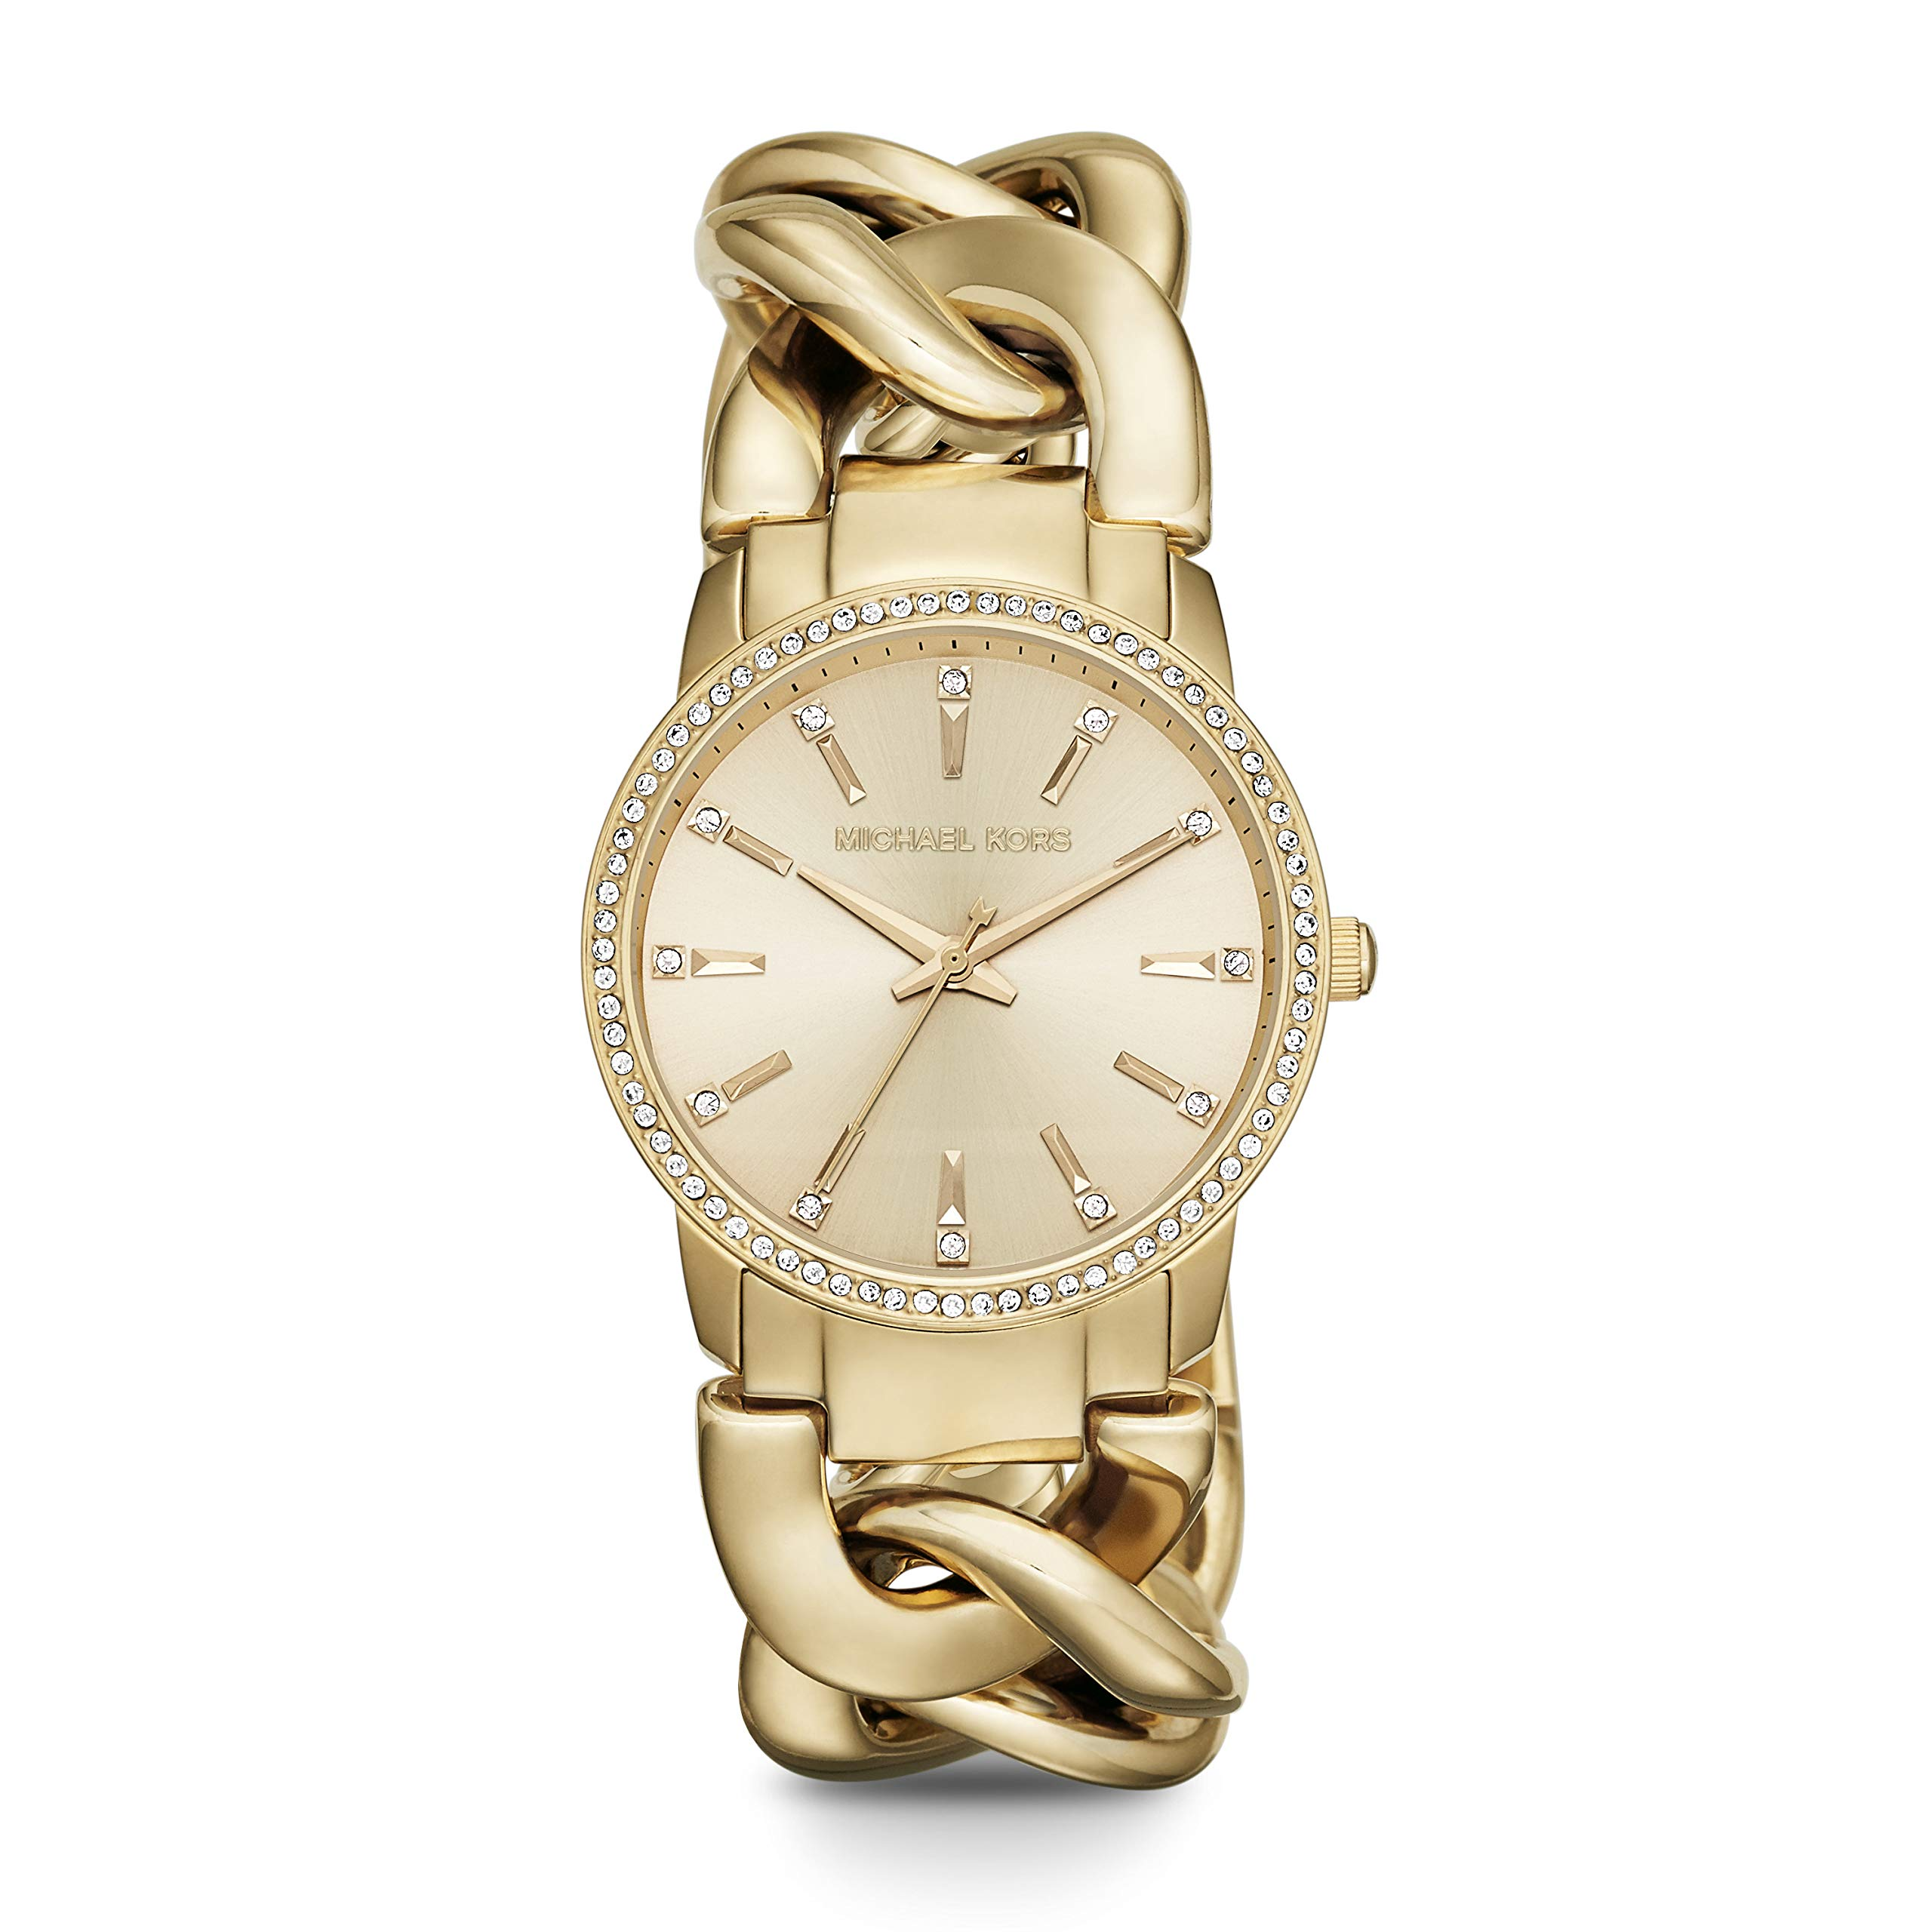 Michael Kors Women's Lady Nini Chain Watch three hand quartz movement with crystal bezel